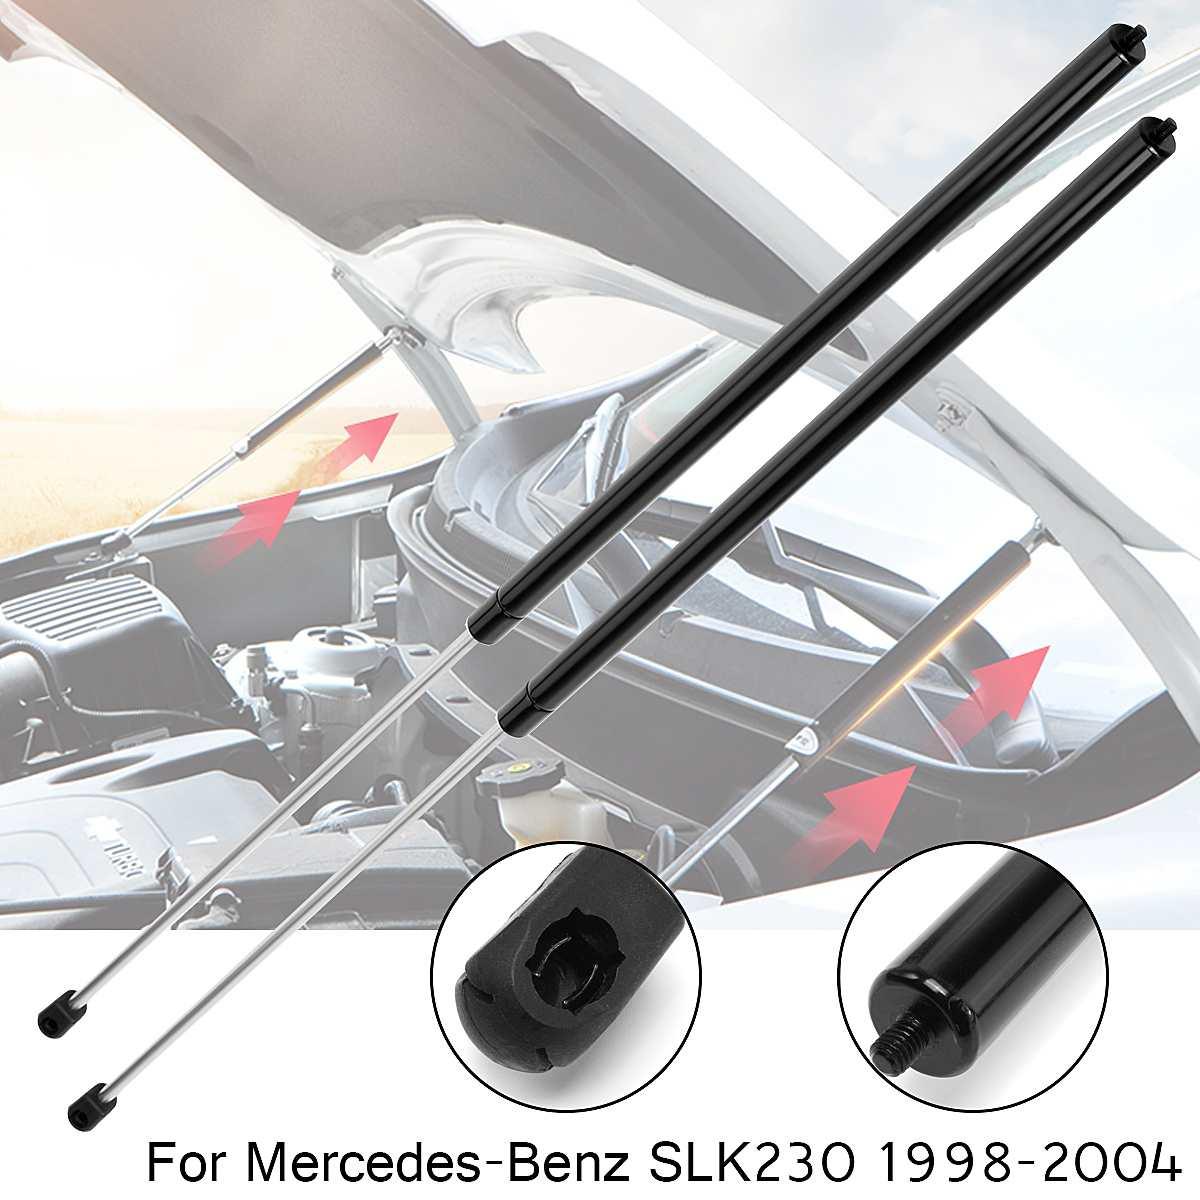 2pcs Car Hood Shock Strut Damper Lift Support Insert Black